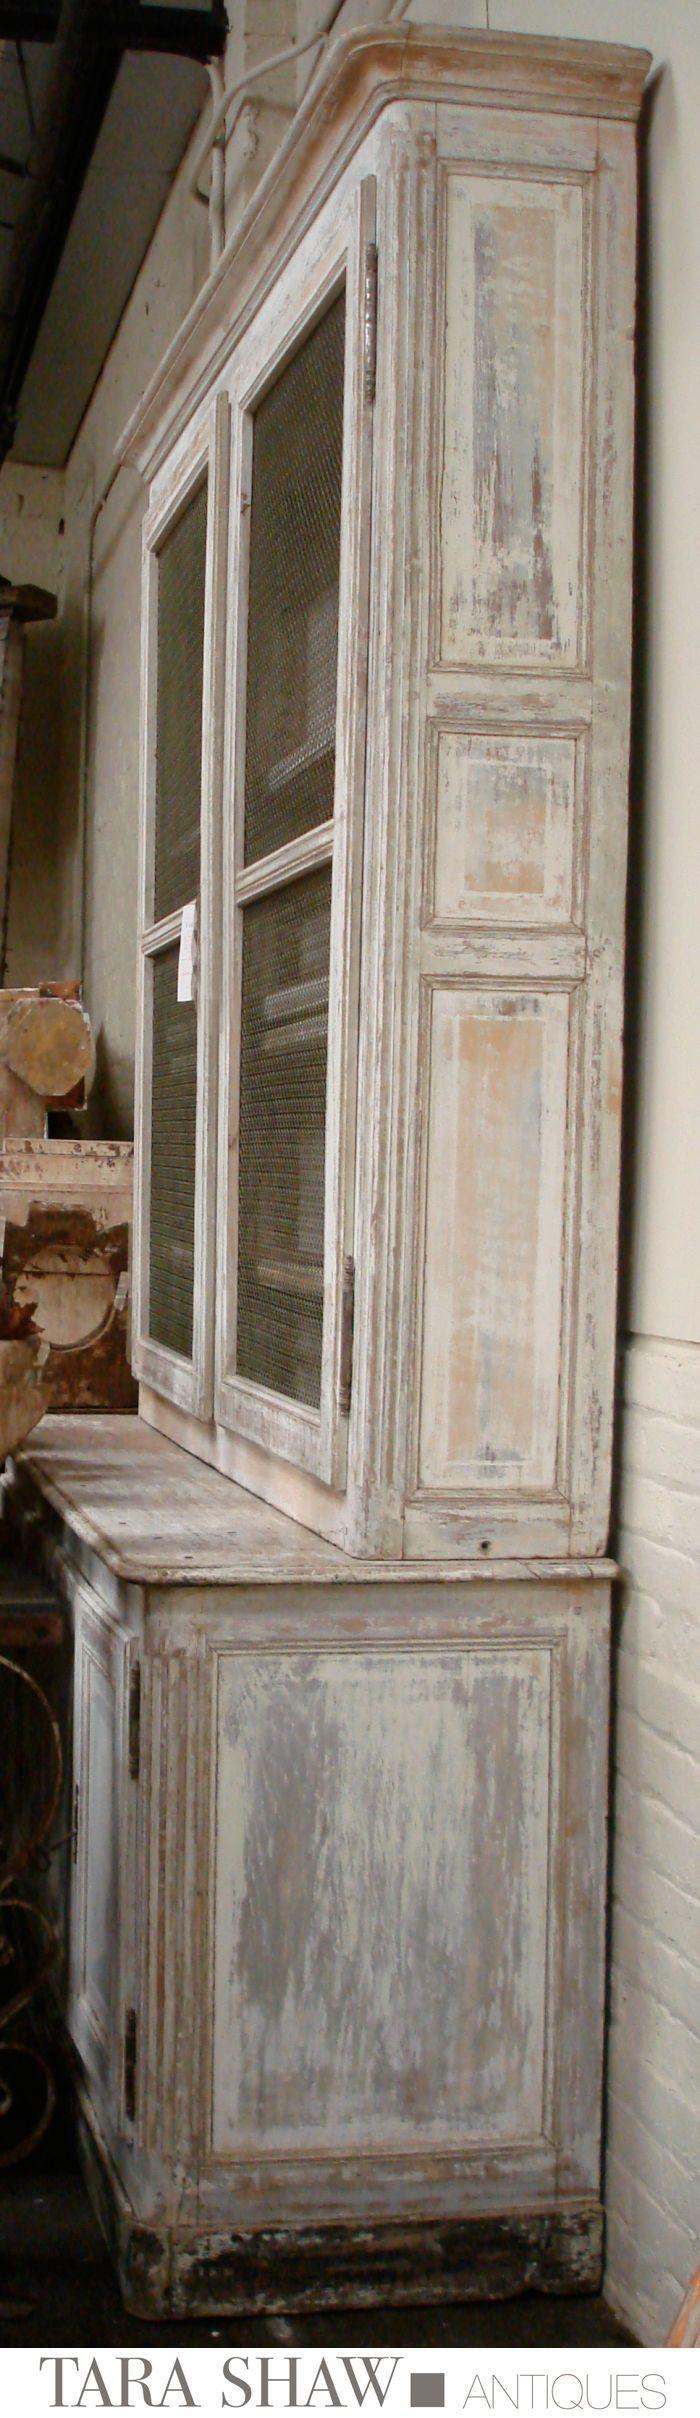 hardwood flooring store burlington ontario of 188 best wood inspiration images on pinterest oak flooring oak inside beautiful finish on this piece